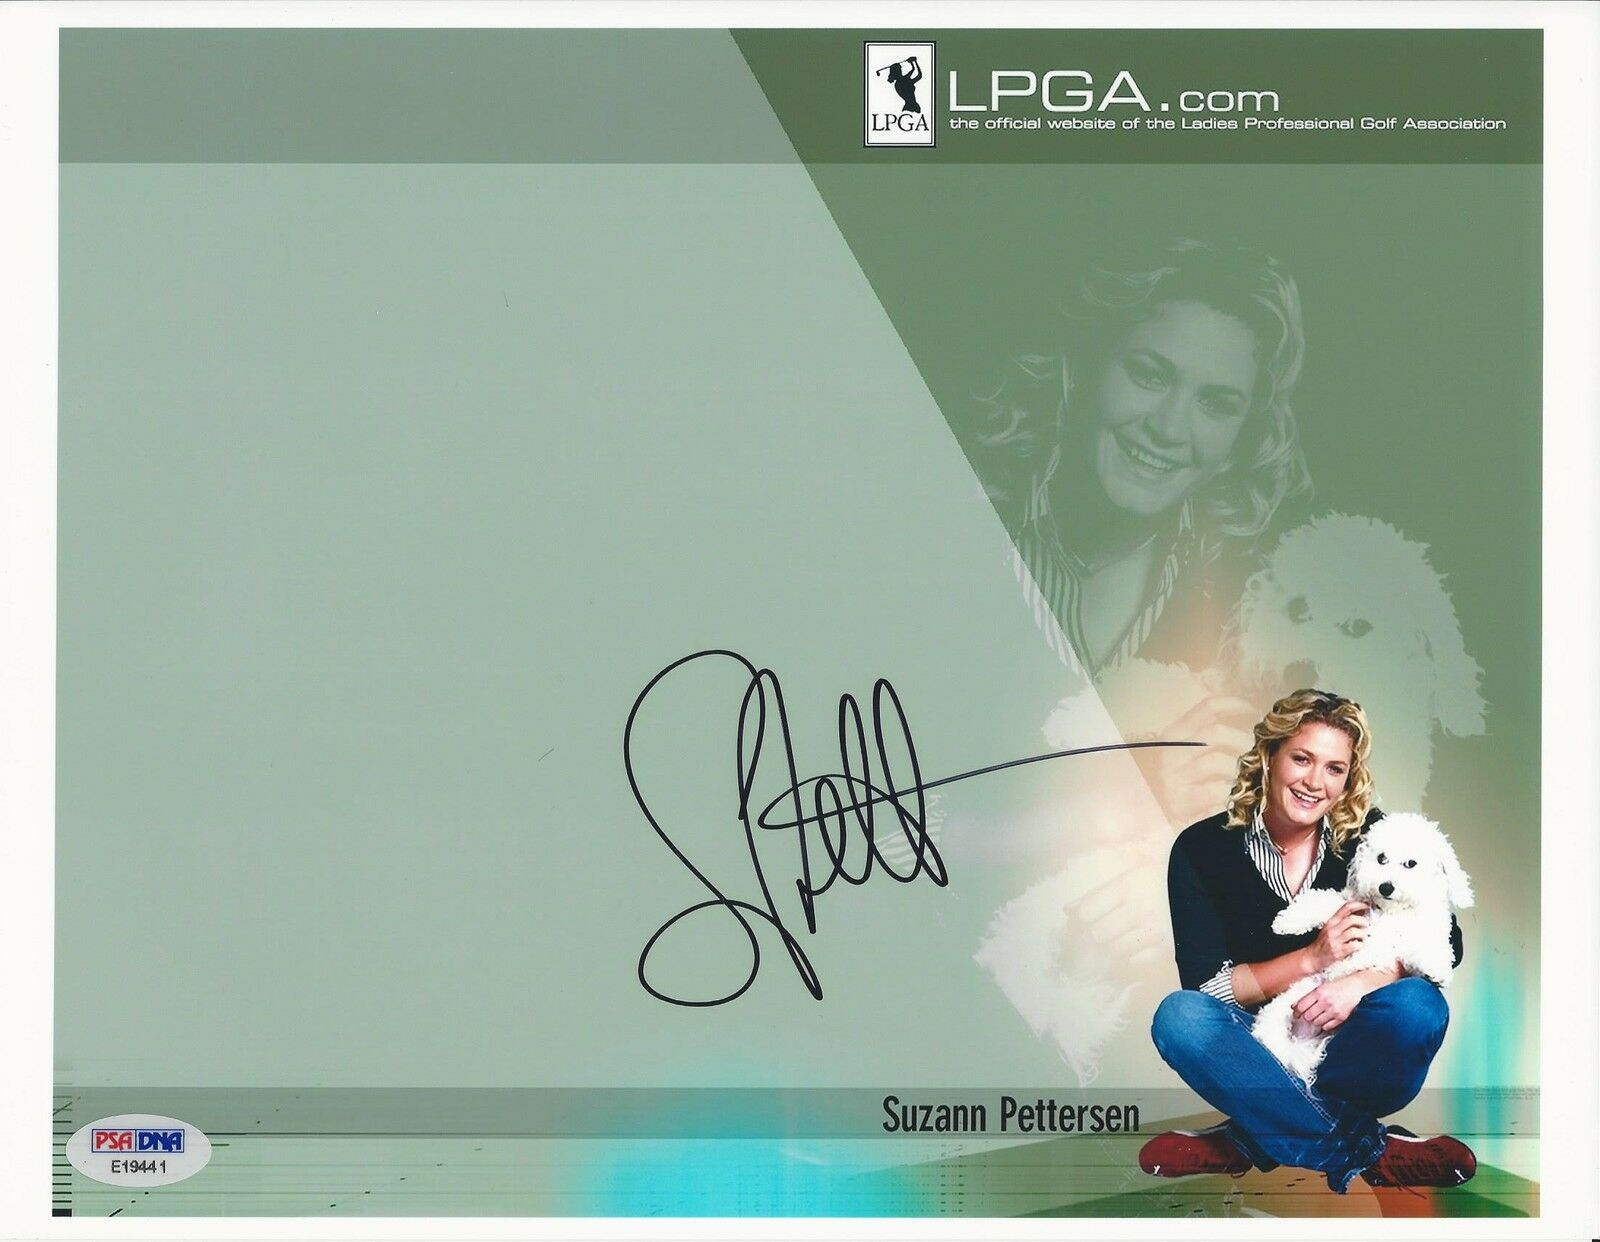 Suzann Petersen LPGA Golf signed 8x10 photo PSA/DNA #E19441